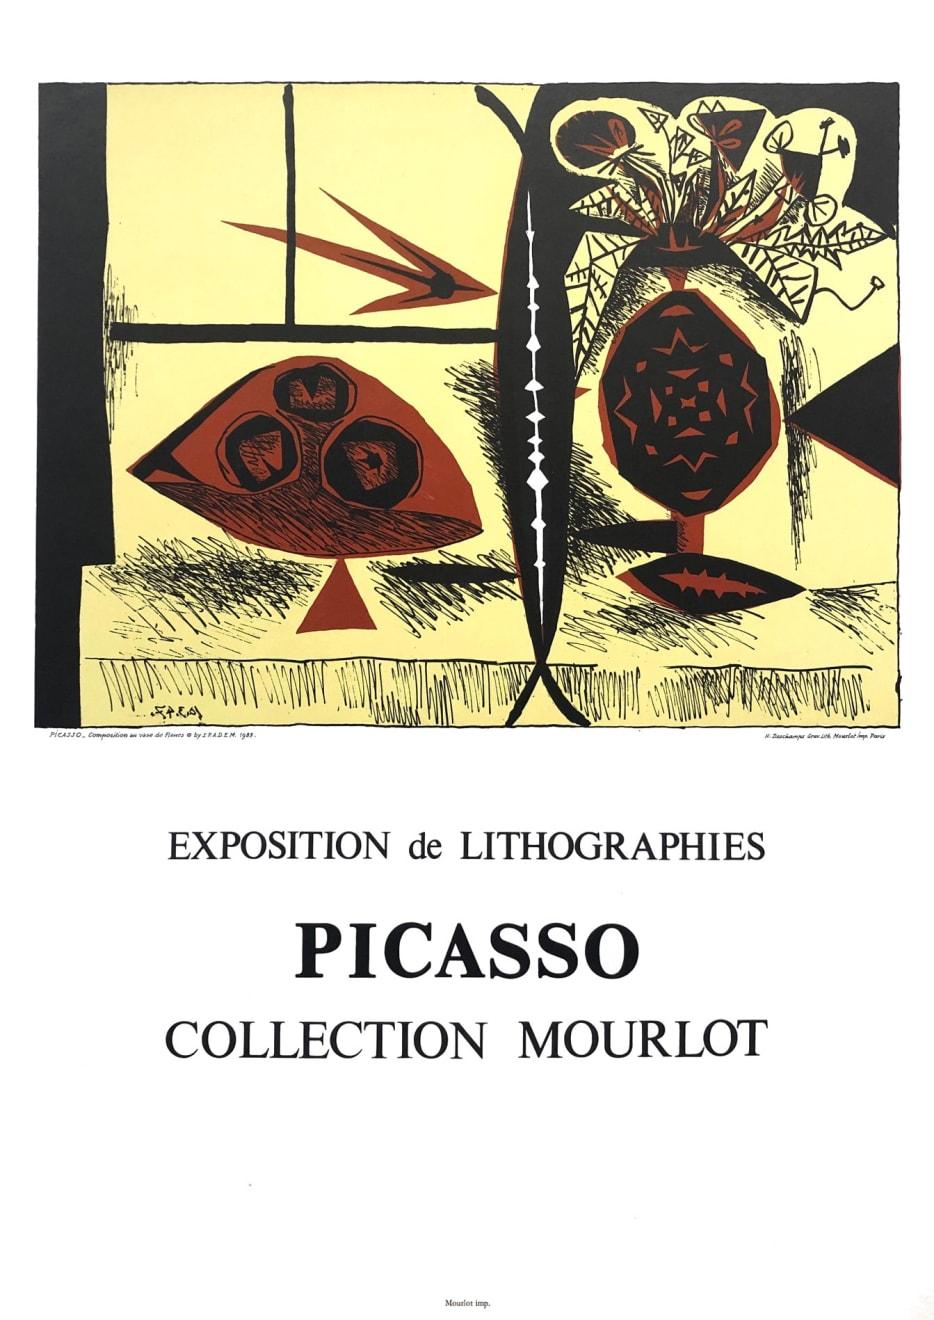 Pablo Picasso, 'Exposition de Lithographies' Picasso Poster , 1988